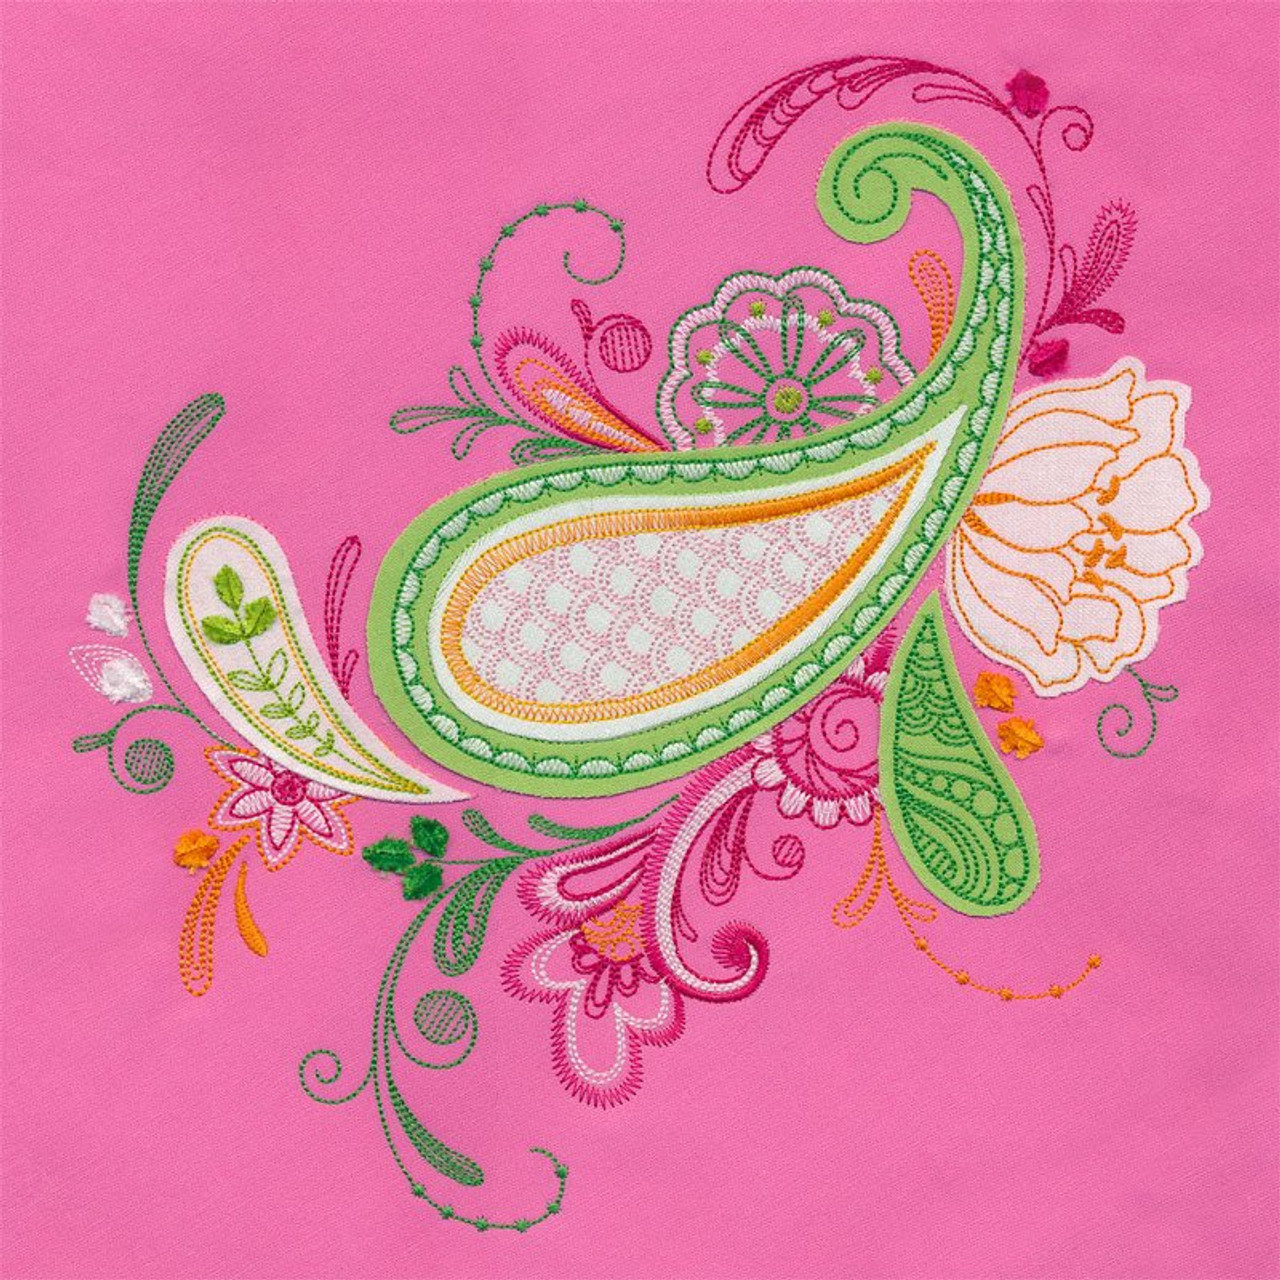 Jumbo Tufted Floral Paisley Fantasia